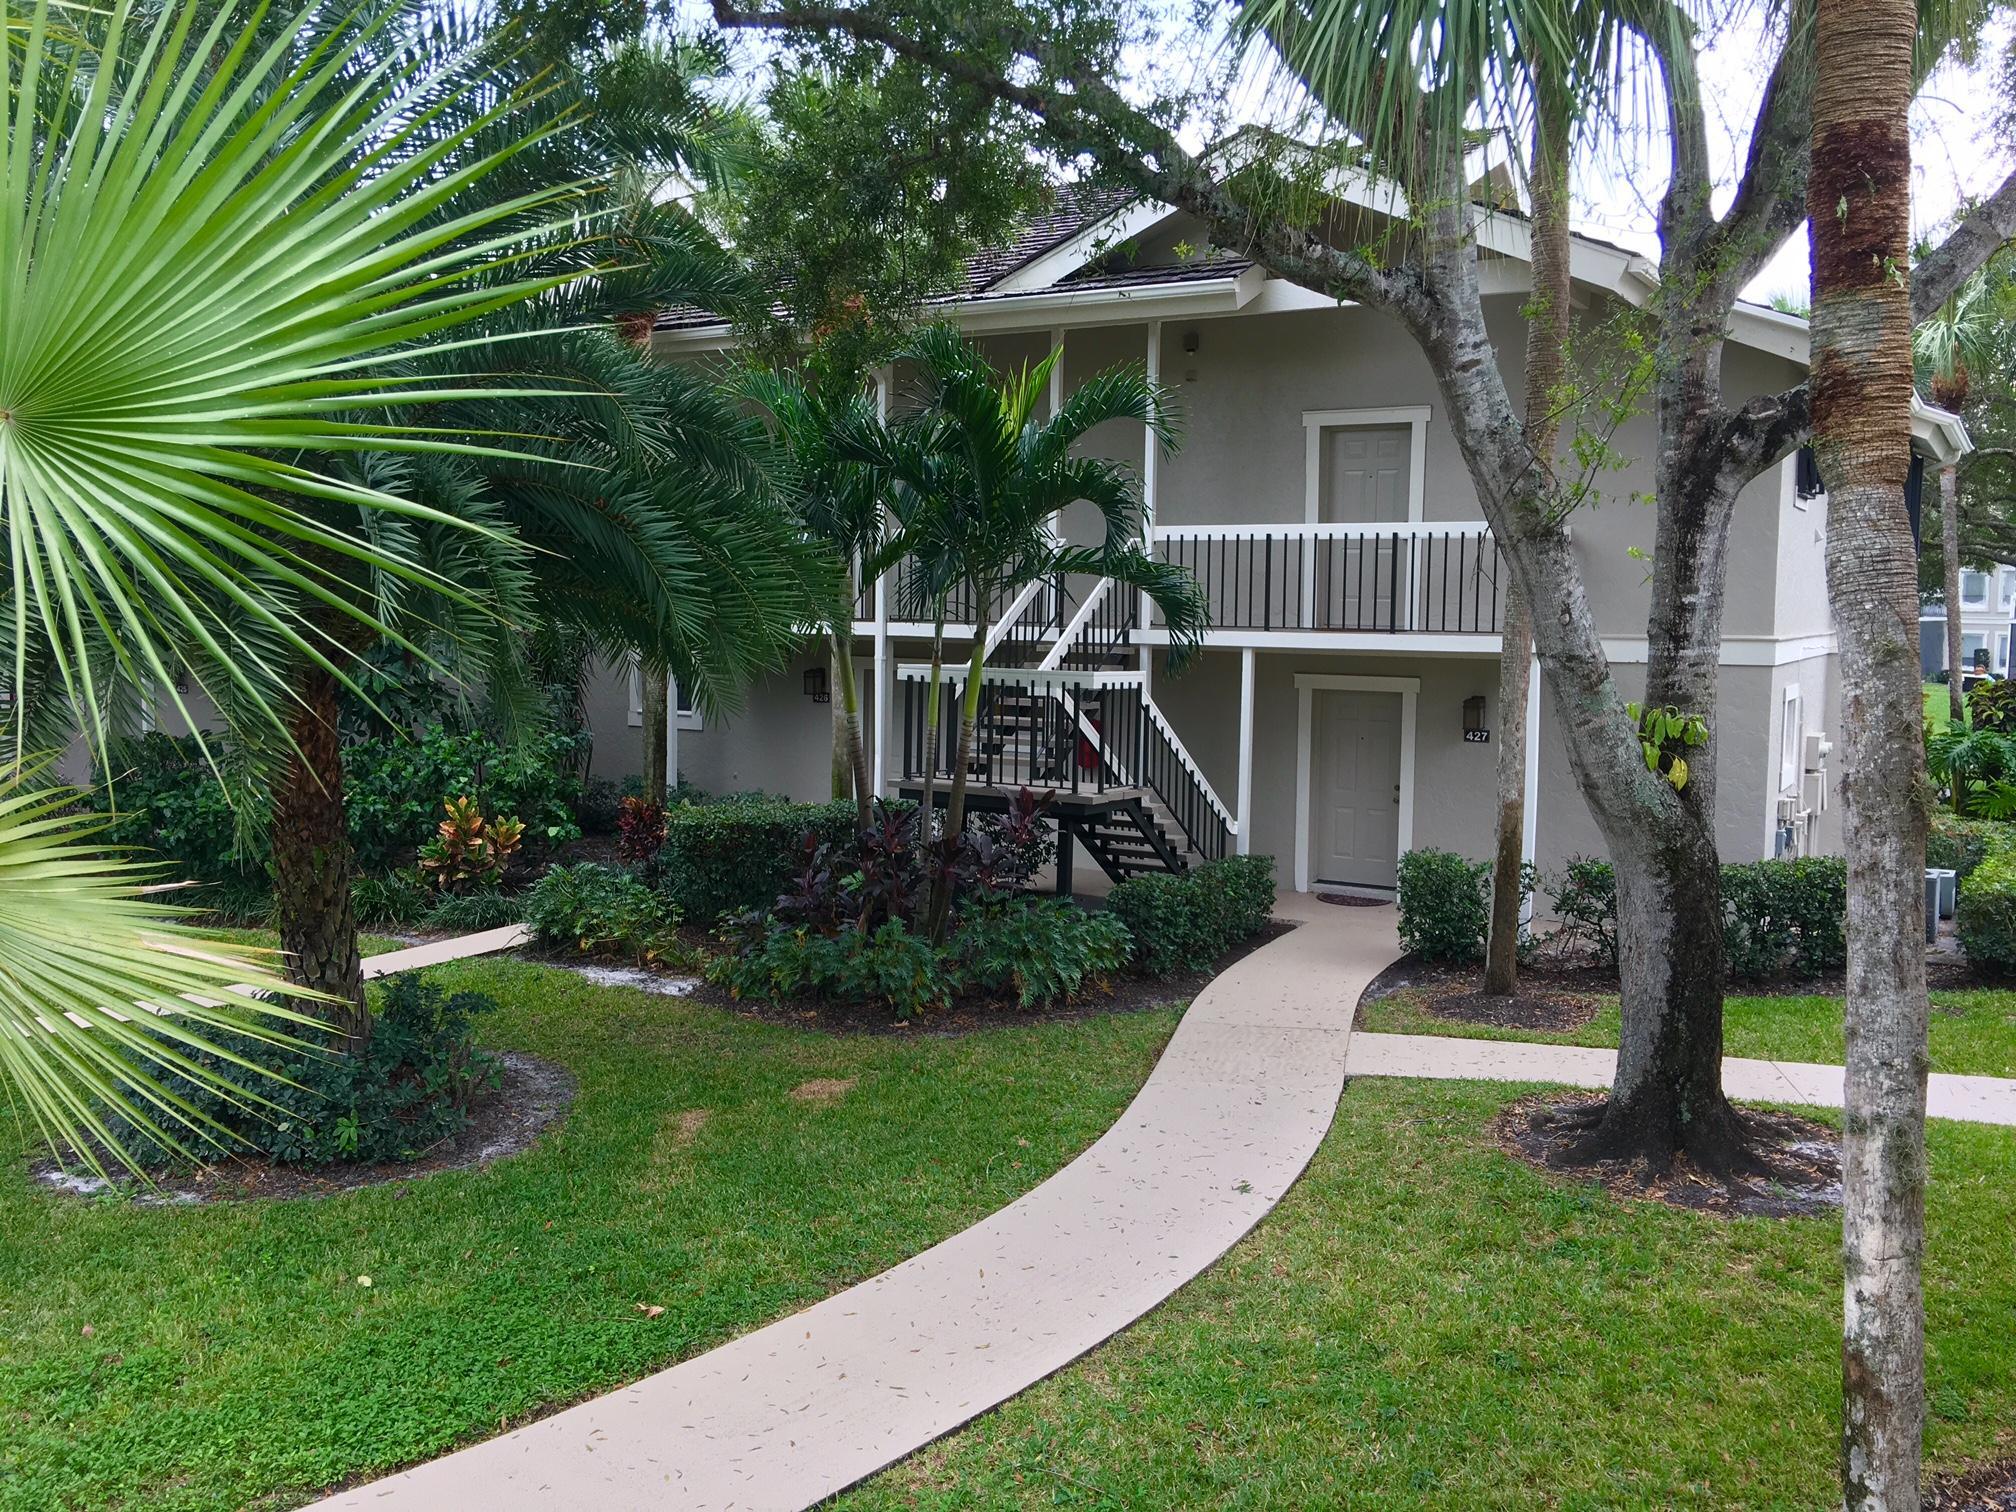 11863 Wimbledon Circle, Wellington, Florida 33414, 1 Bedroom Bedrooms, ,1 BathroomBathrooms,Condo/Coop,For Rent,Palm Beach Polo,Wimbledon,2,RX-10534403